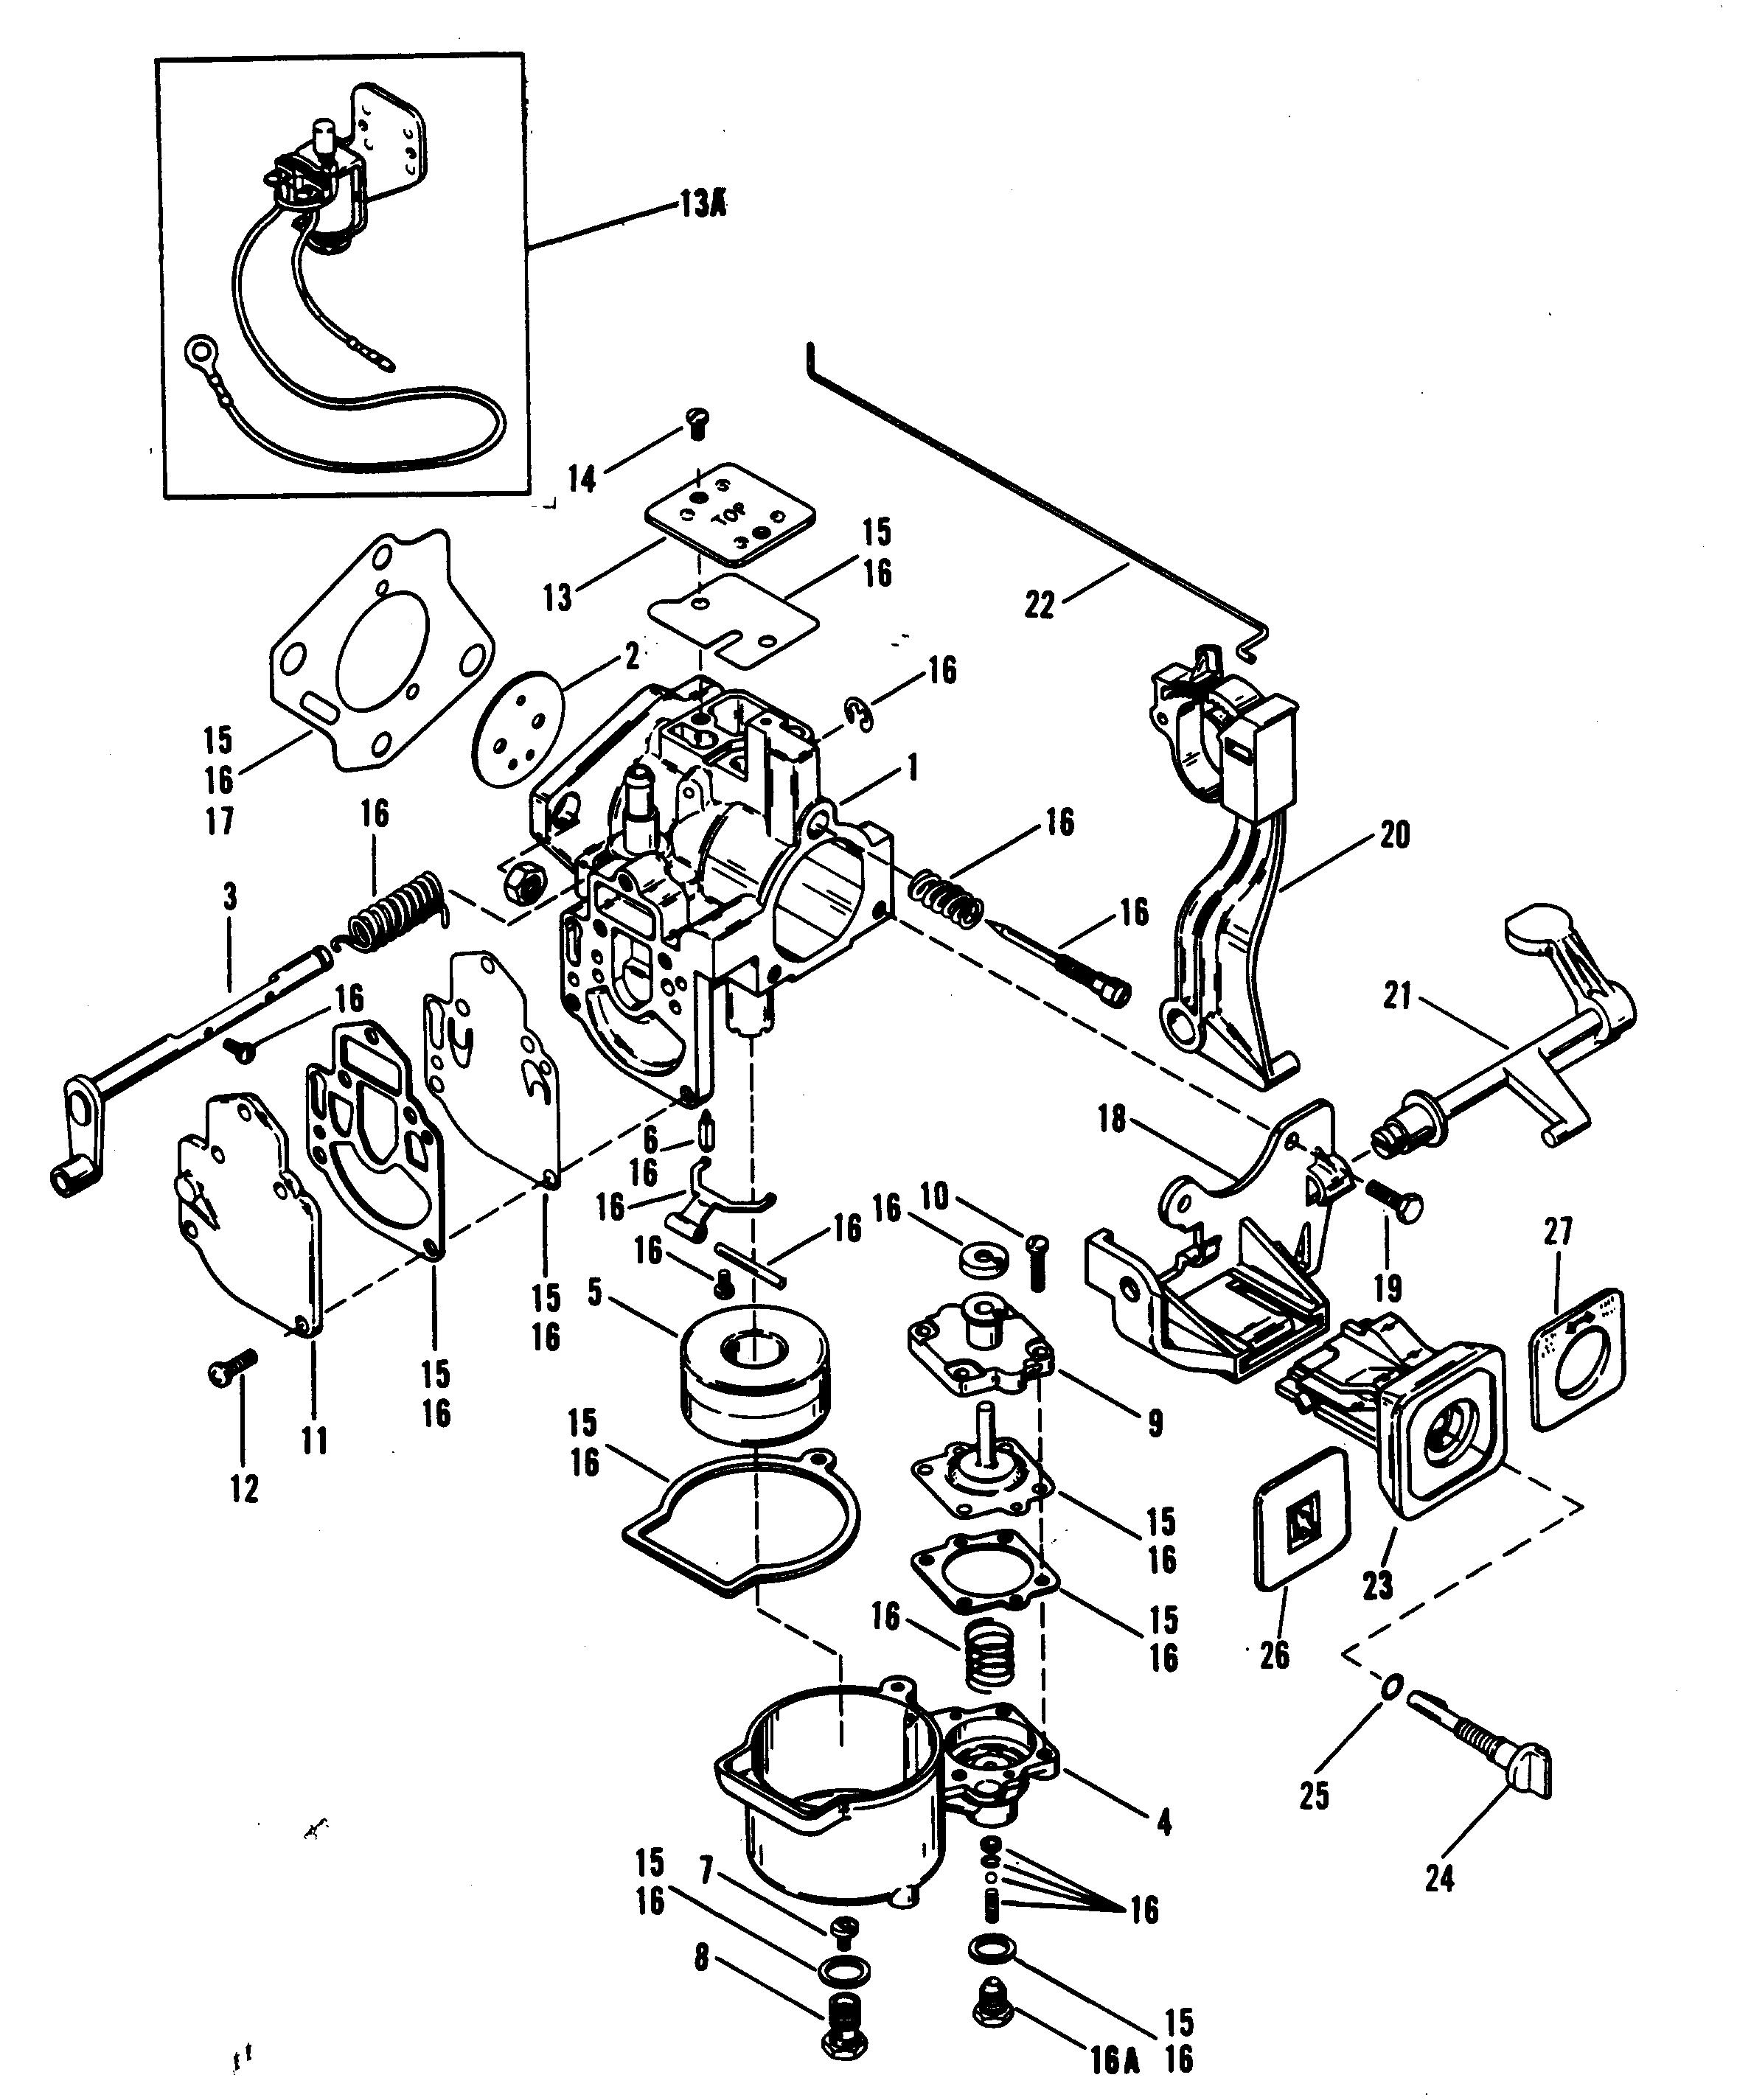 [GJFJ_338]  CT_9811] Wiring Diagram For 25 Hp Mercury Outboard Schematic Wiring | 25 Hp Mercury Outboard Control Wiring Diagram |  | Subd Dogan Bocep Mohammedshrine Librar Wiring 101